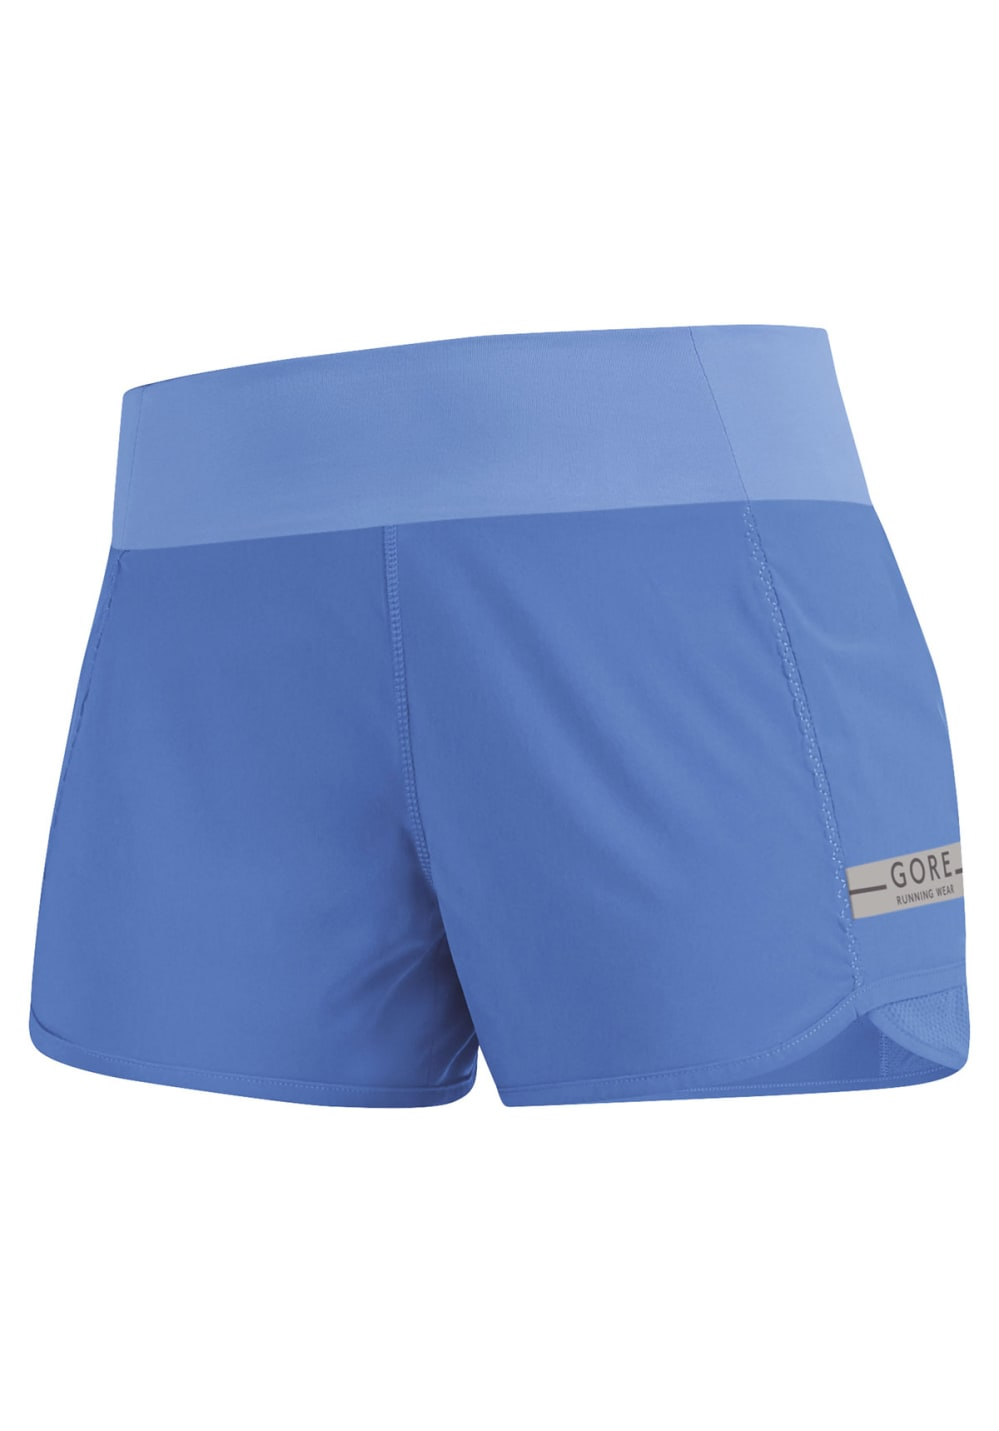 Mujer Gore Running Para Azul Wear® Shorts Pantalones De Air Yvfb6gyI7